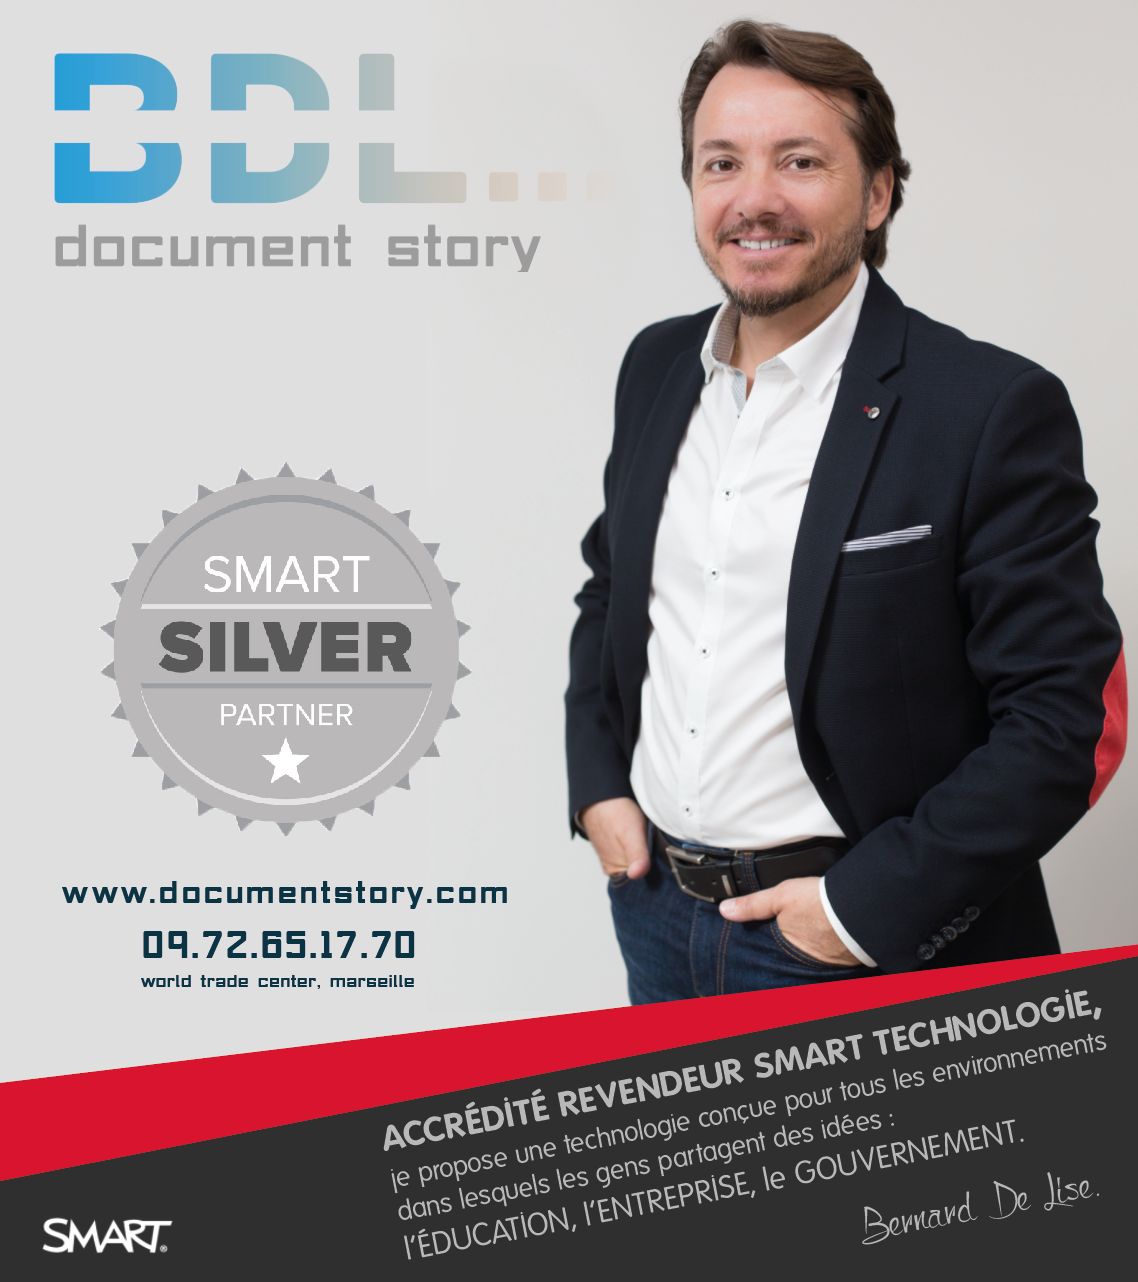 bdl-documentstory1